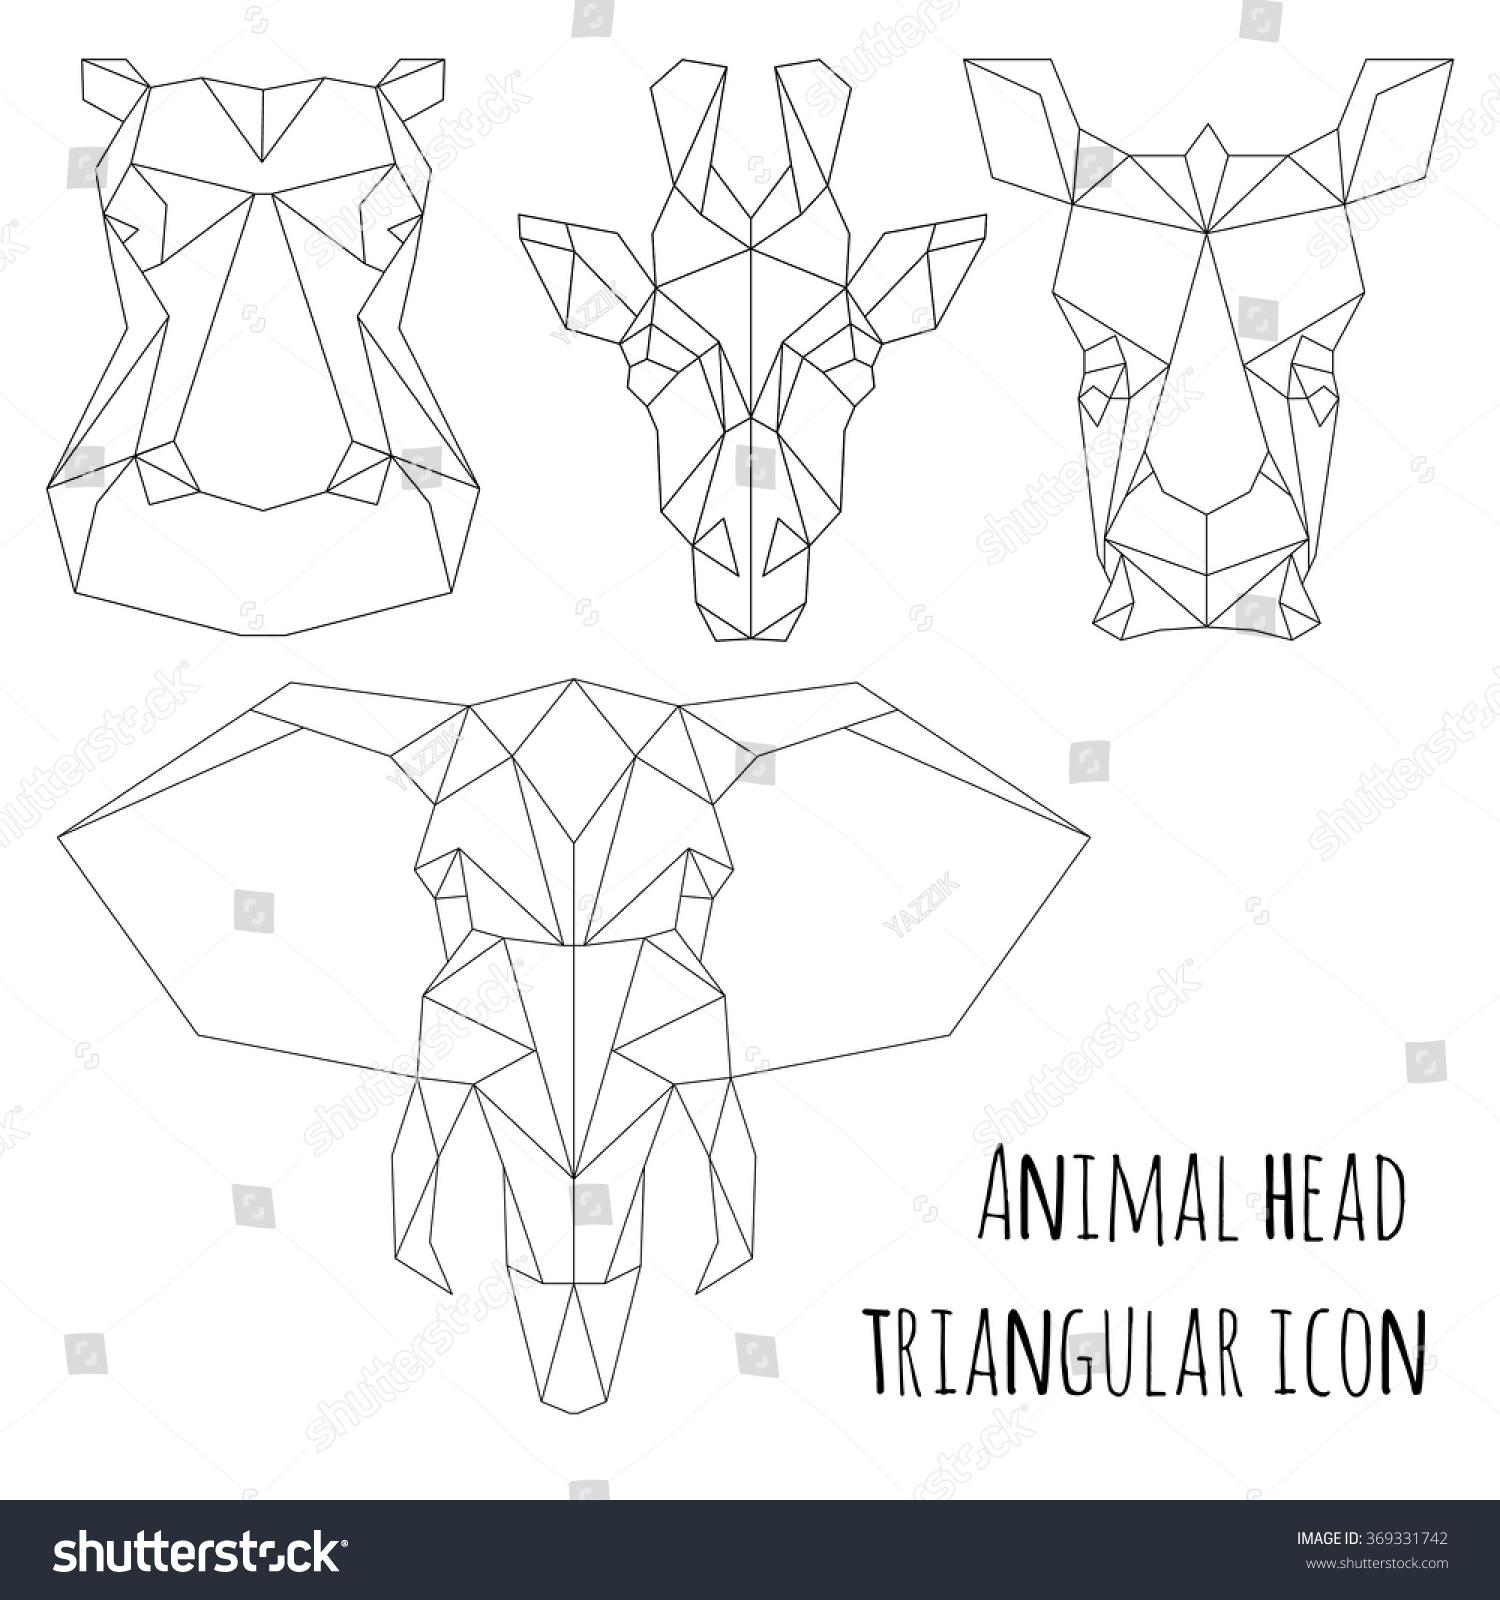 hight resolution of animal head triangular icon geometric trendy line design vector illustration ready for tattoo or coloring book animal africa elephant giraffe